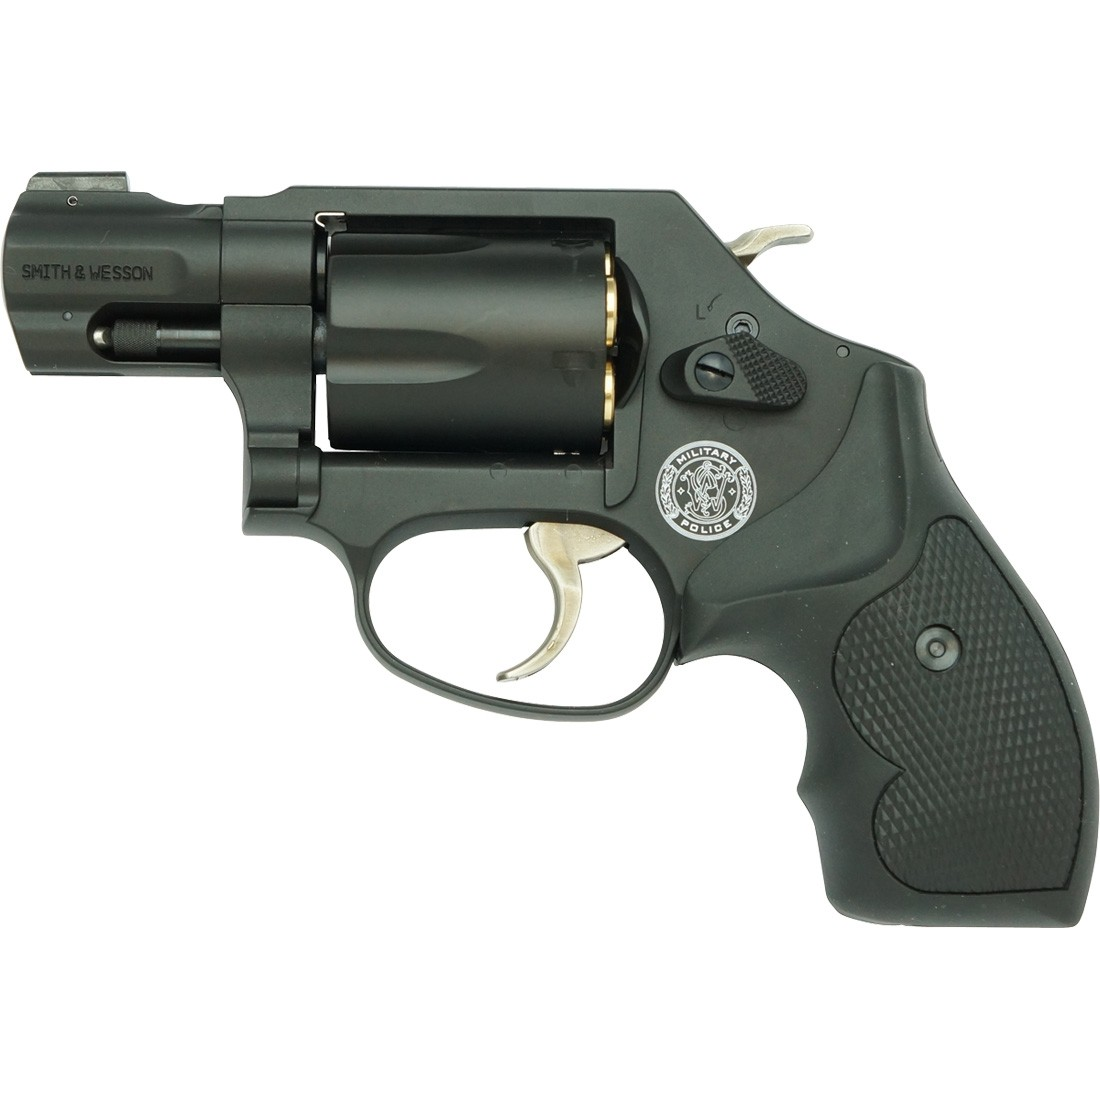 "Tanaka S&W M&P 360 .357 Magnum 2"" ABS + Cerakote Airsoft Revolver"